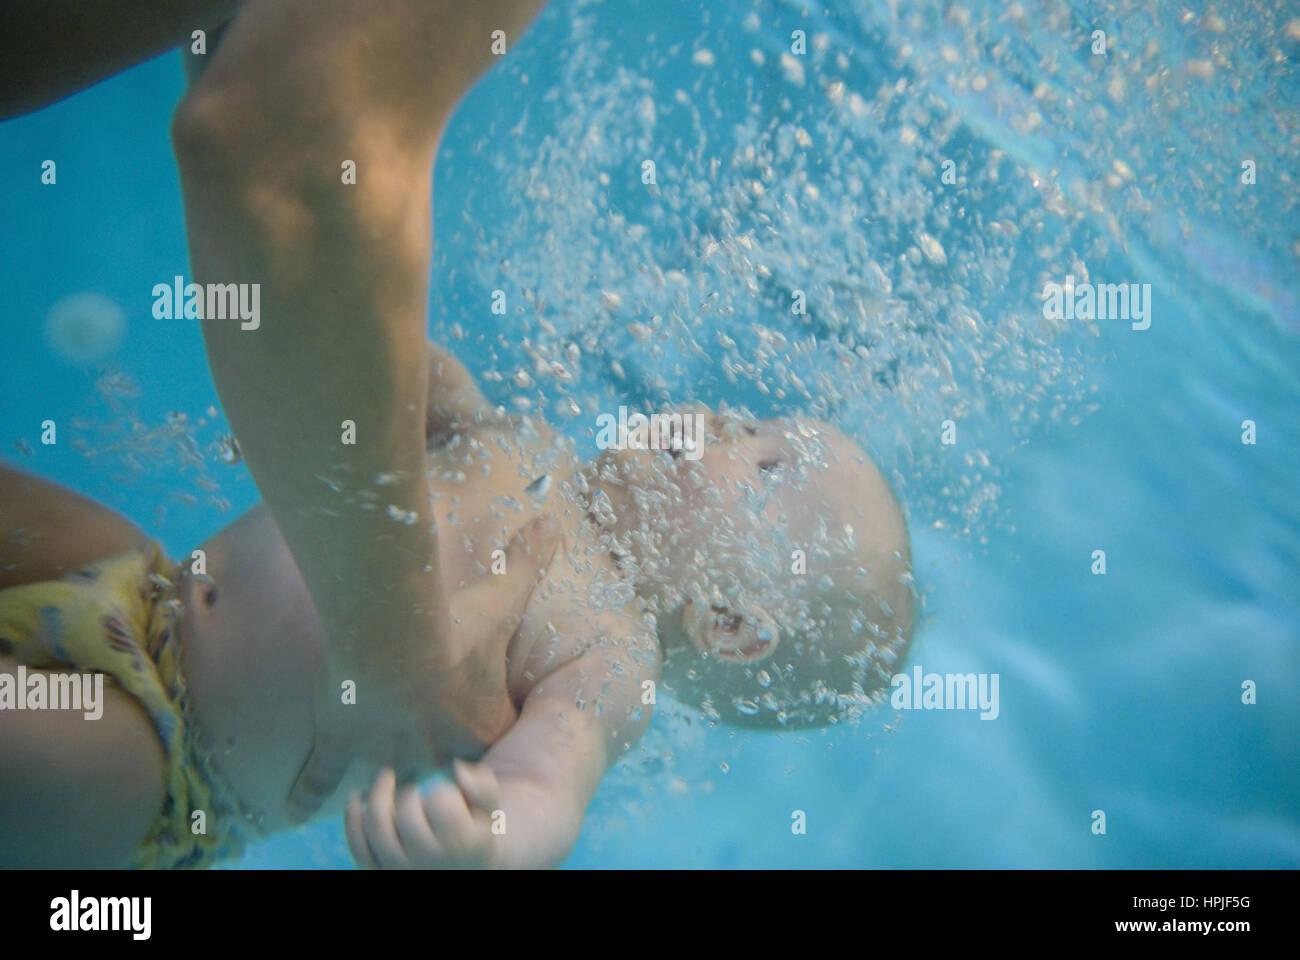 Babyschwimmkurs Stock Photos Babyschwimmkurs Stock Images Alamy